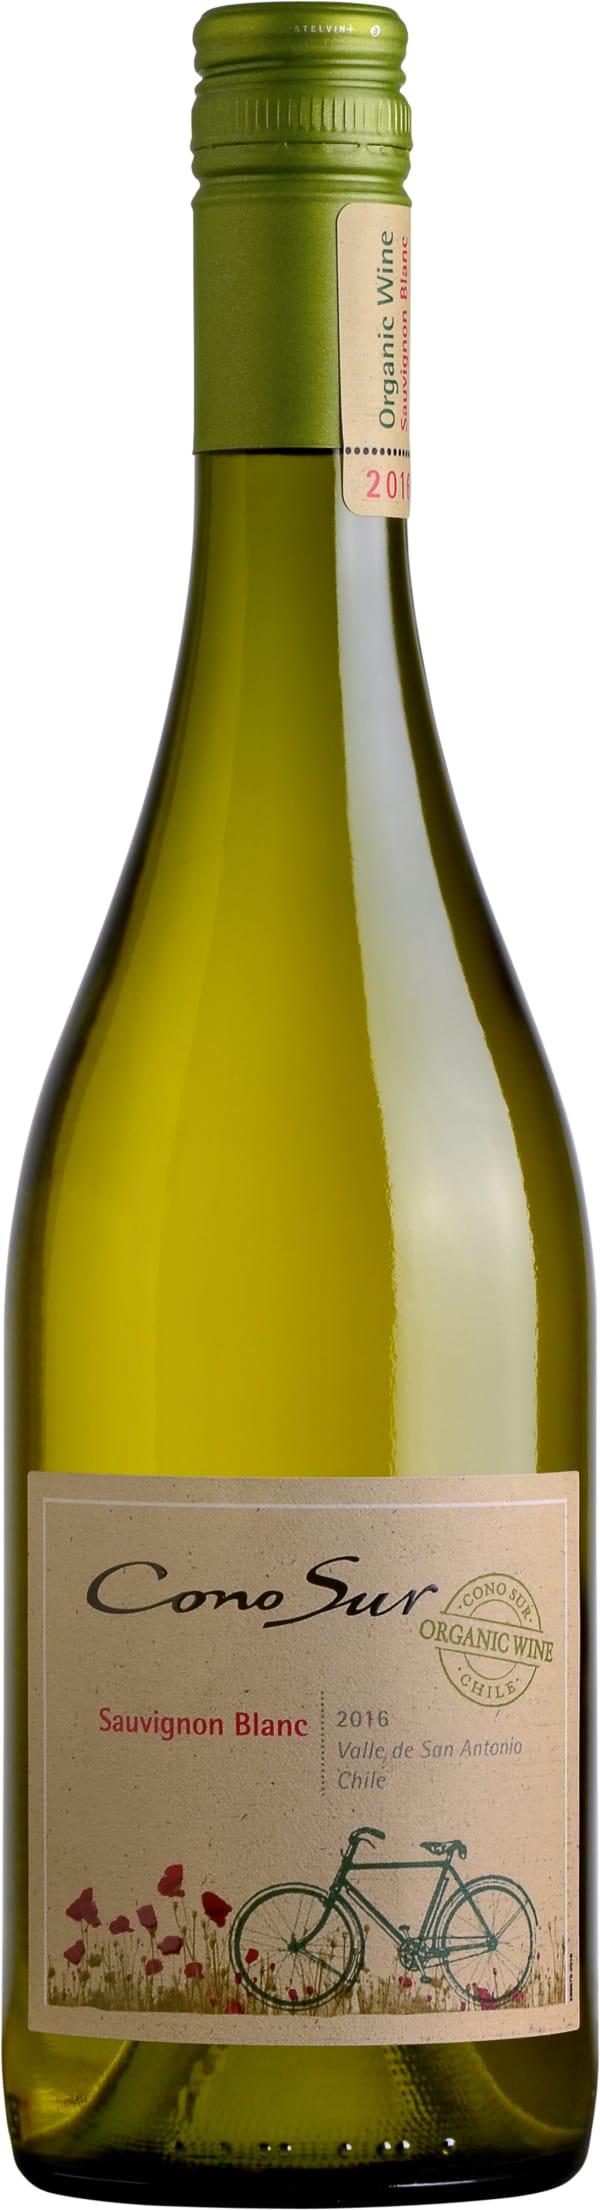 Cono Sur Organic Sauvignon Blanc 2016